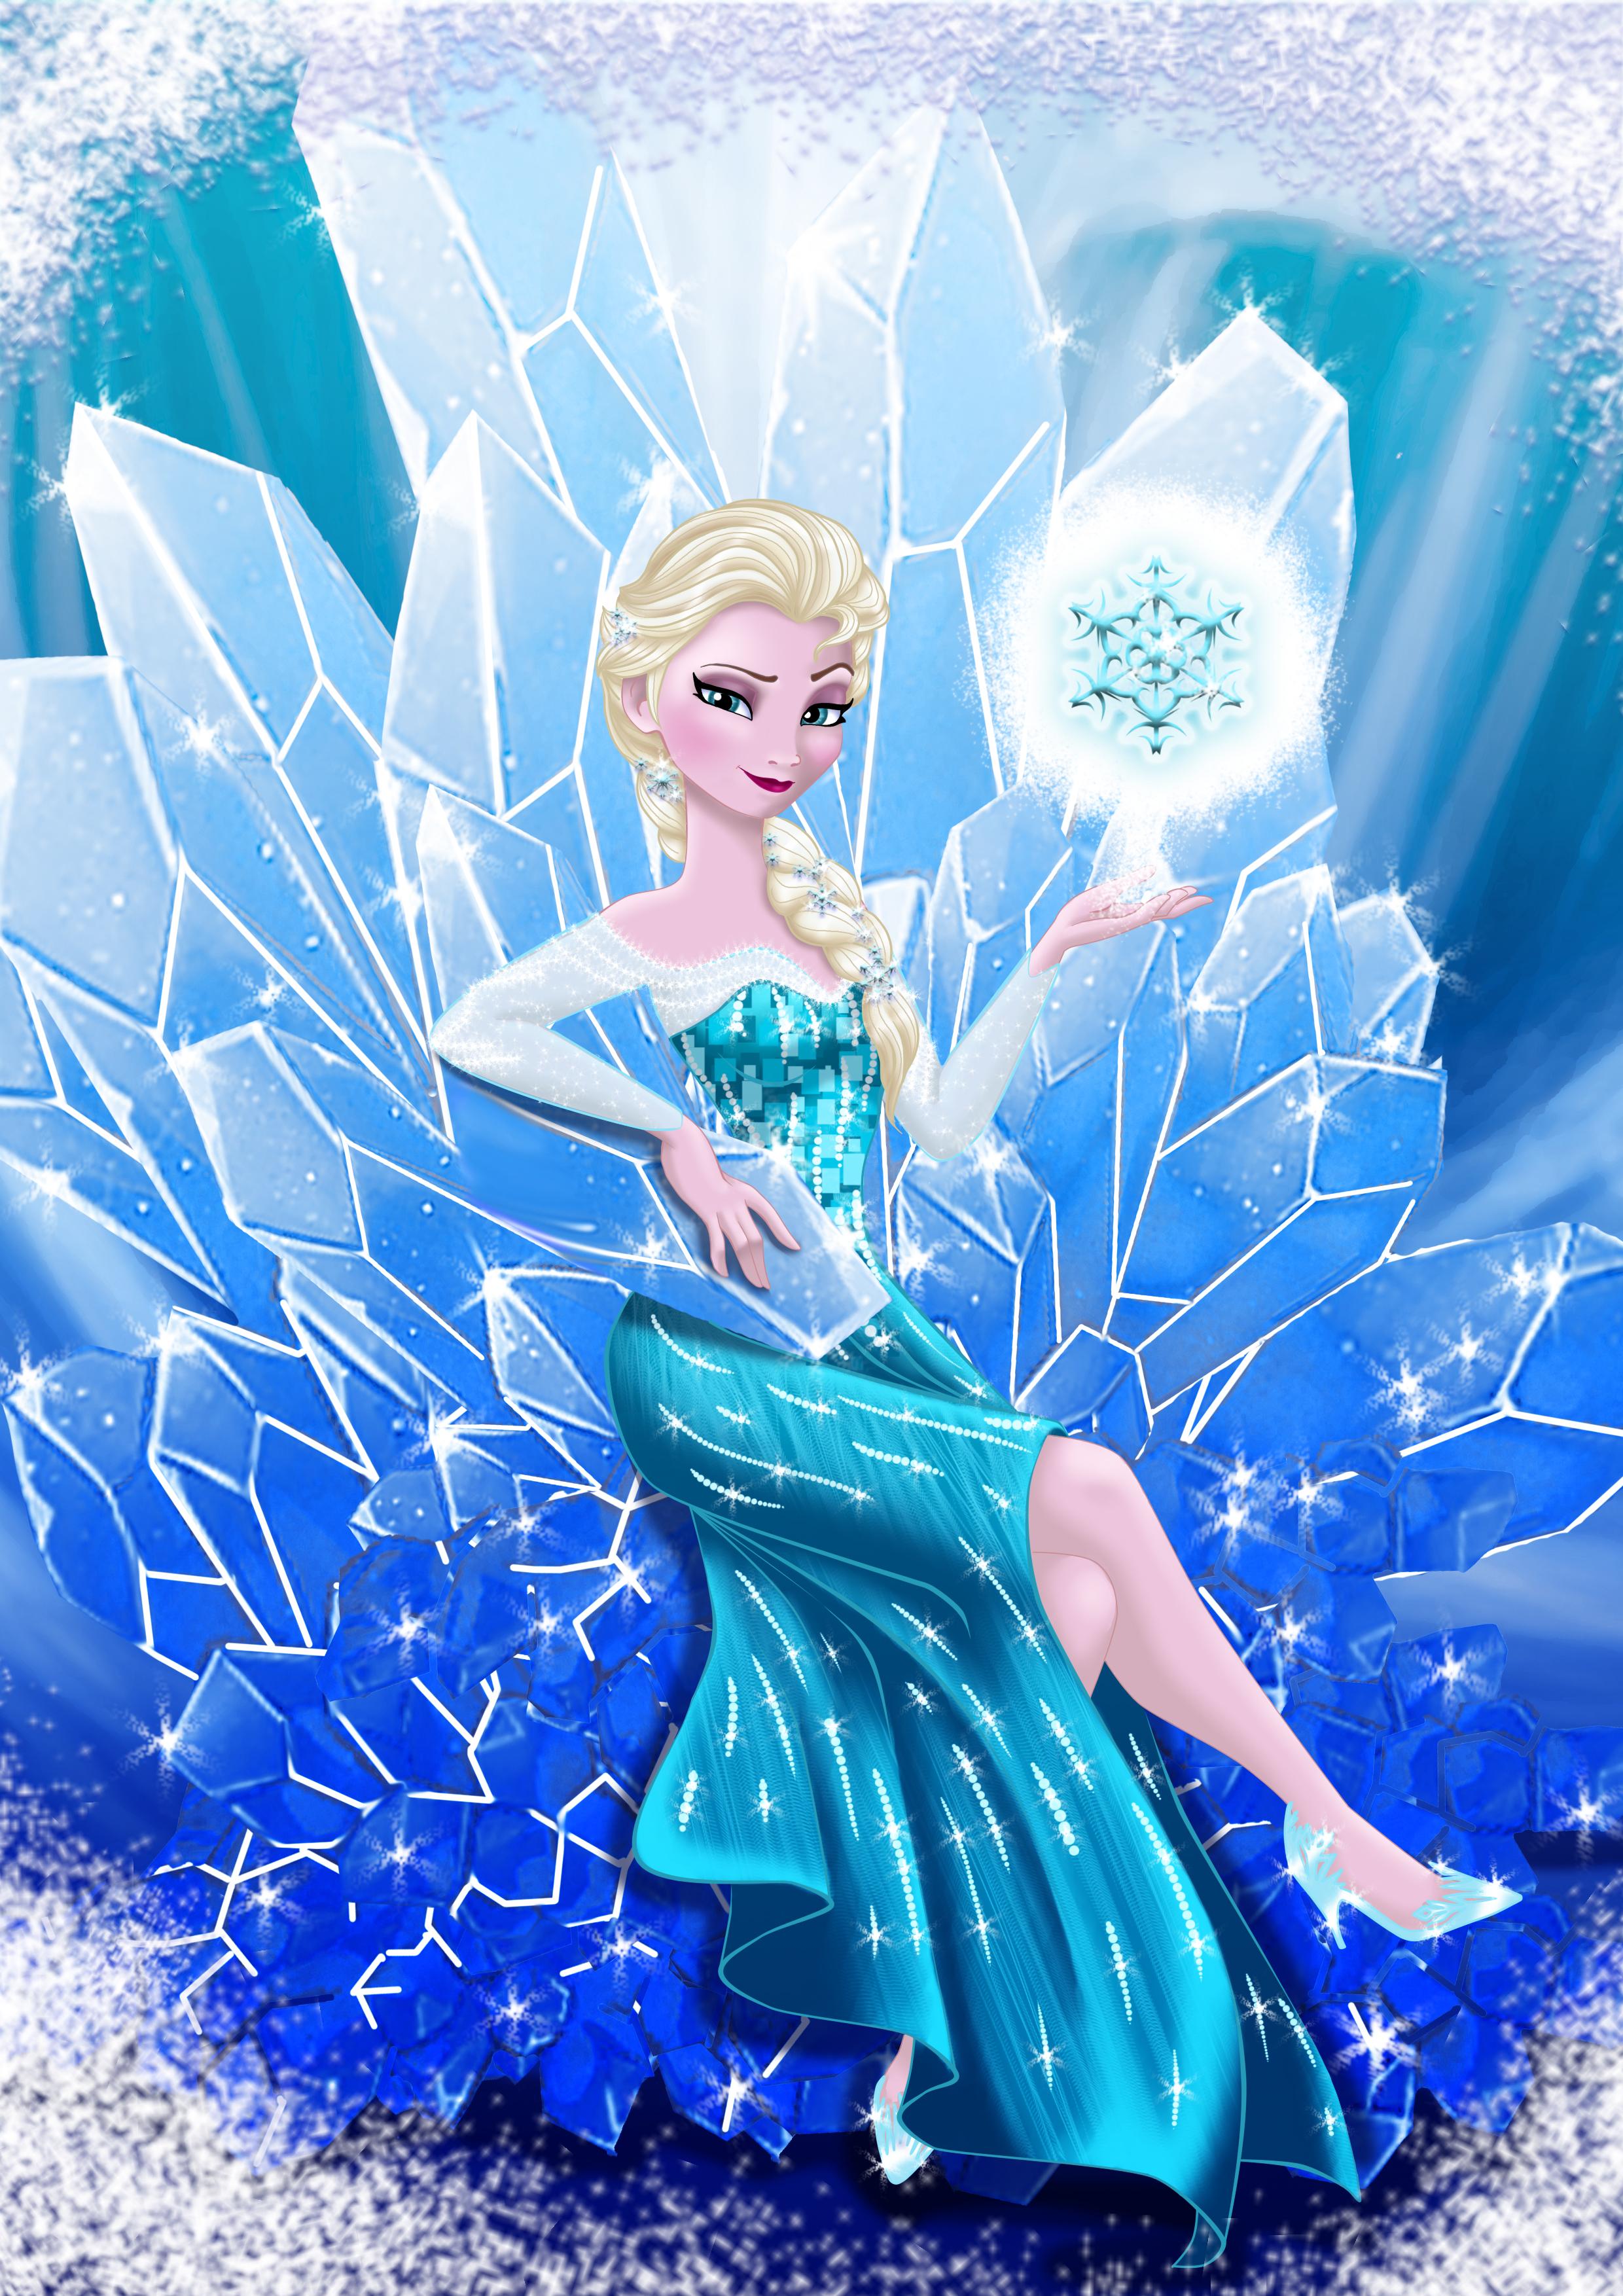 throne_of_ice_by_missmikopete-d6jqoww.jp